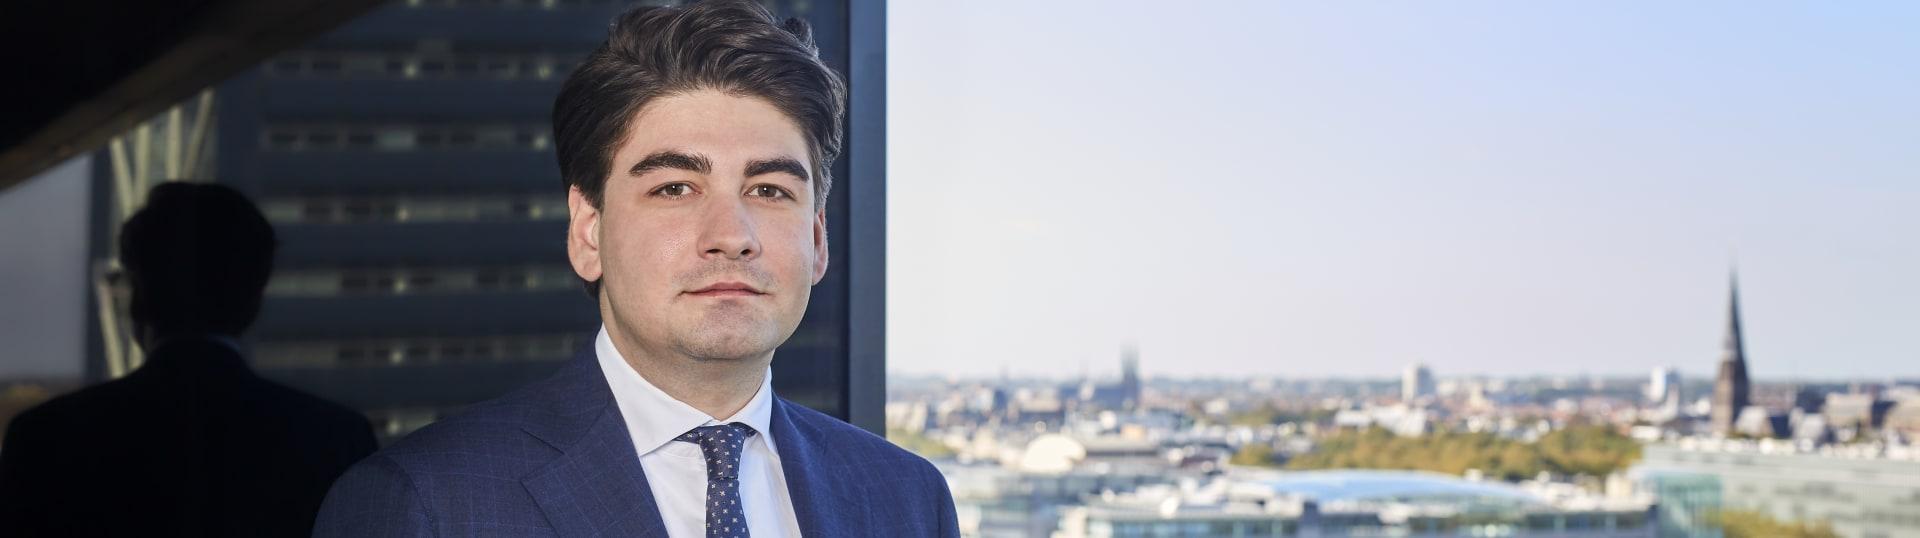 Raimond Dufour, advocaat Pels Rijcken